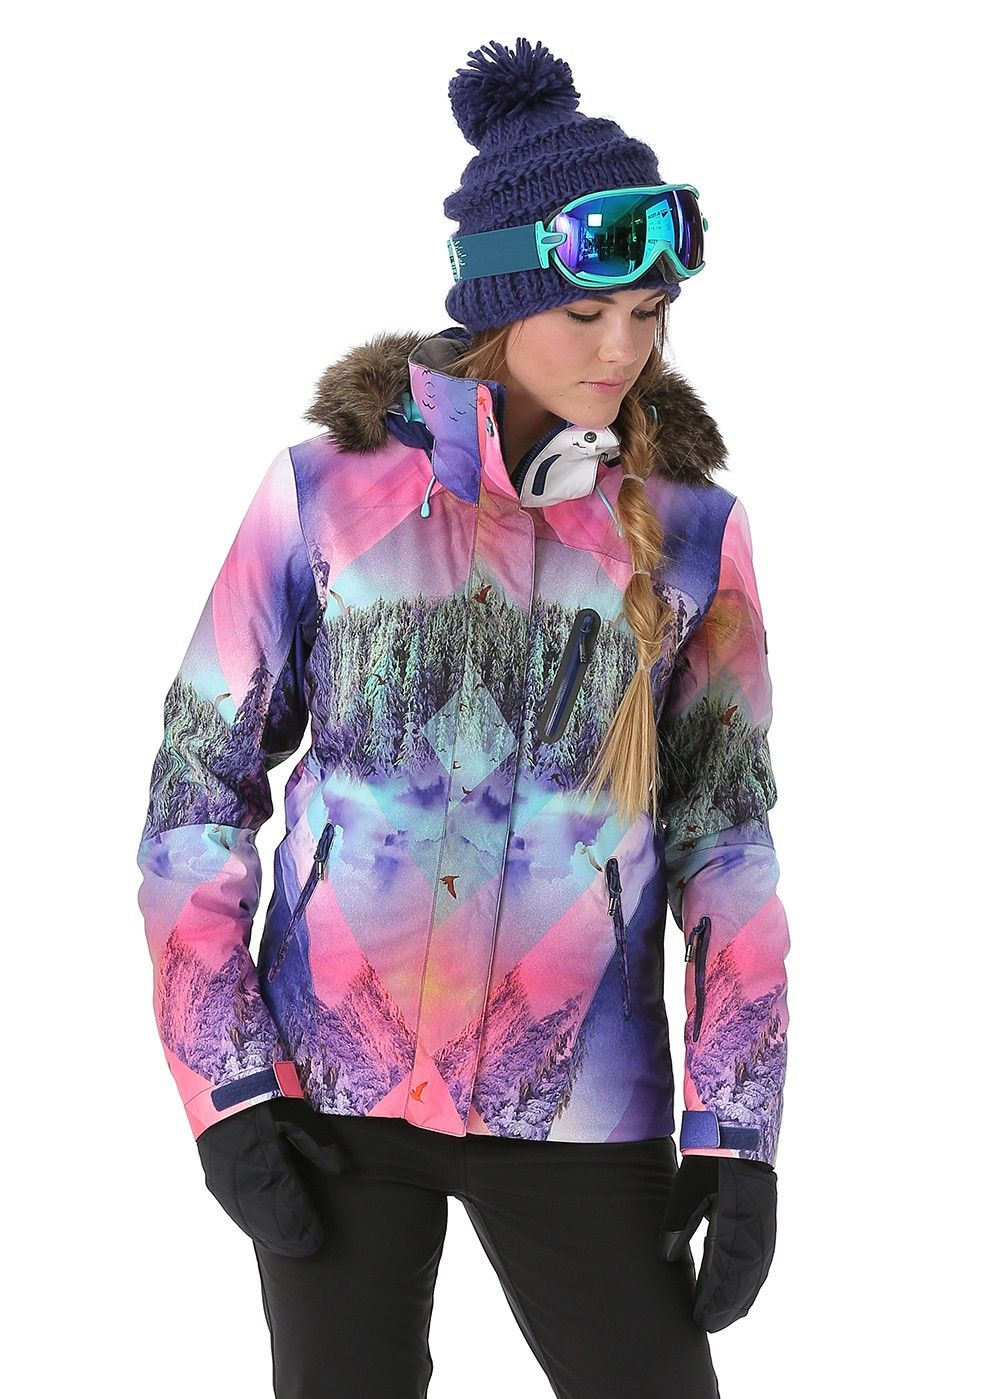 0ed2afb10d60 Roxy Women s Jet Ski Premium Jacket in 2019